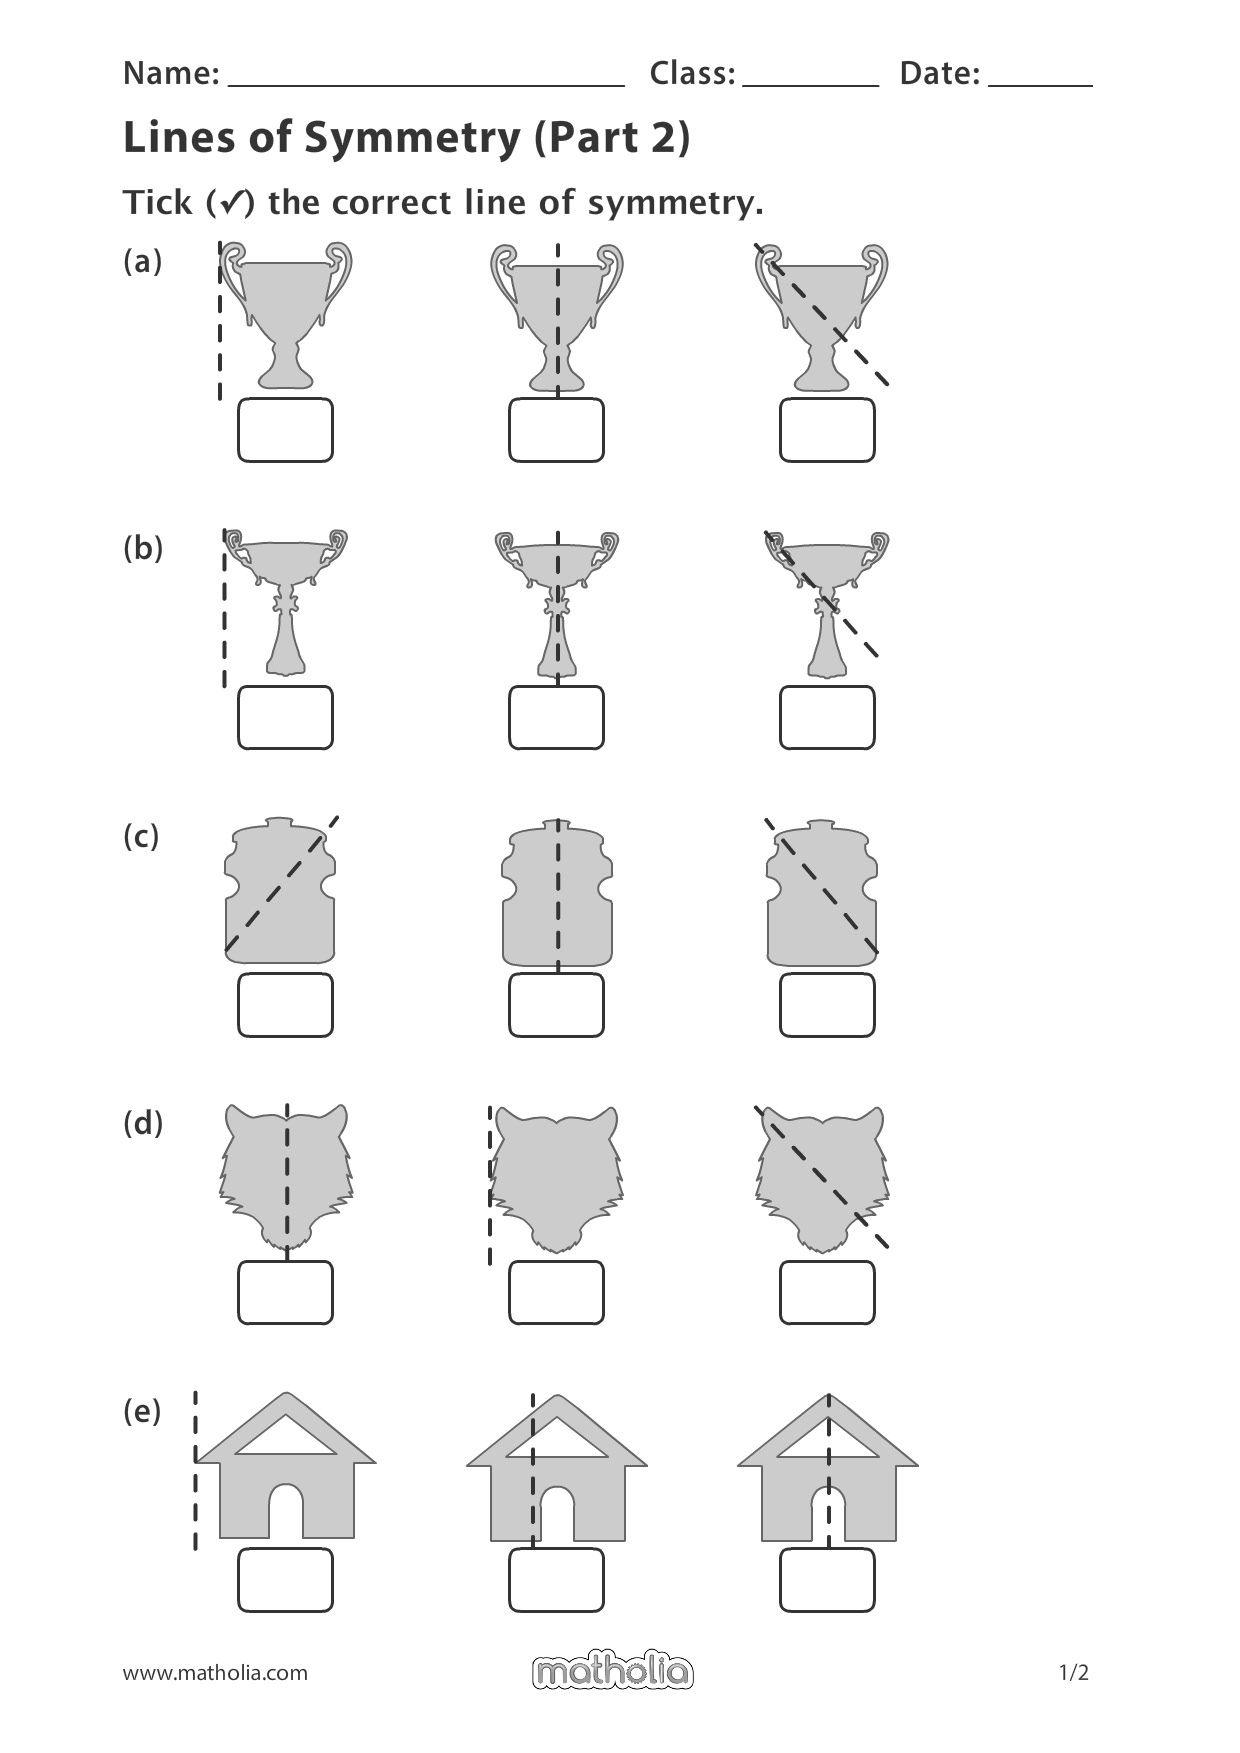 Lines Of Symmetry Part 2 In